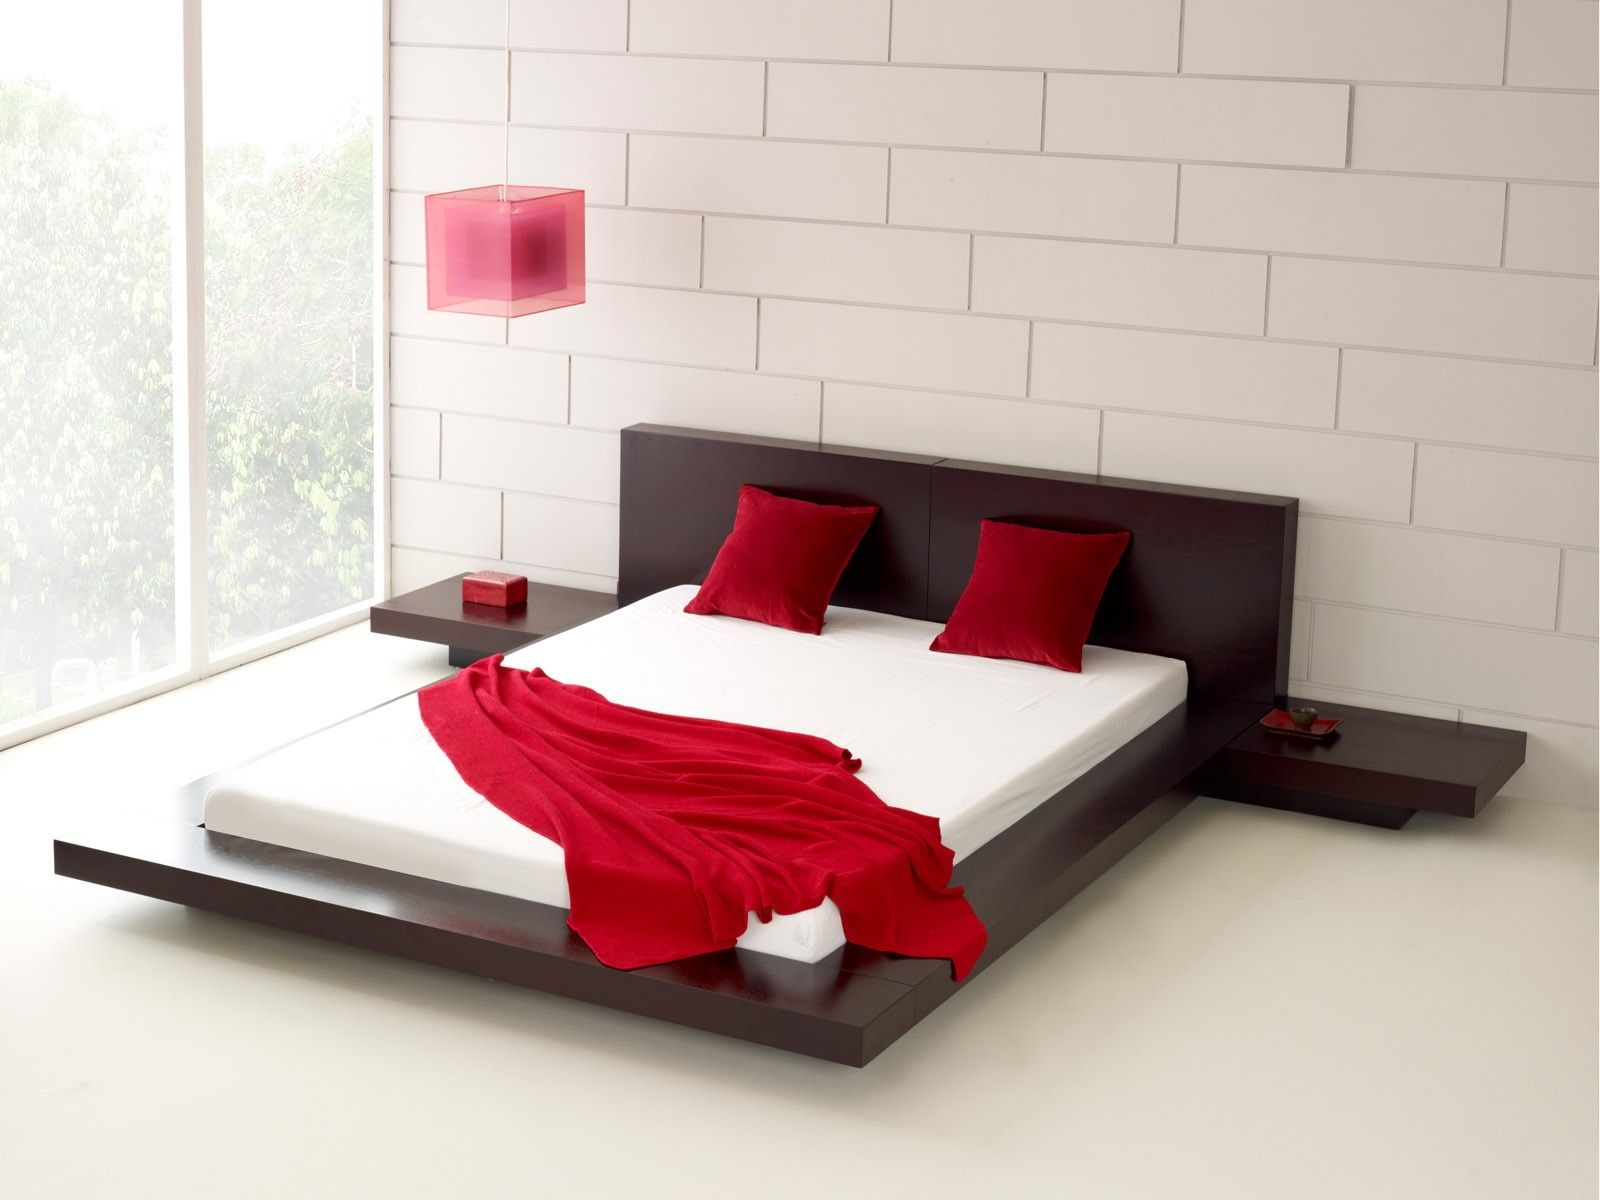 Latest Bedroom Furniture Designs > PierPointSprings.com